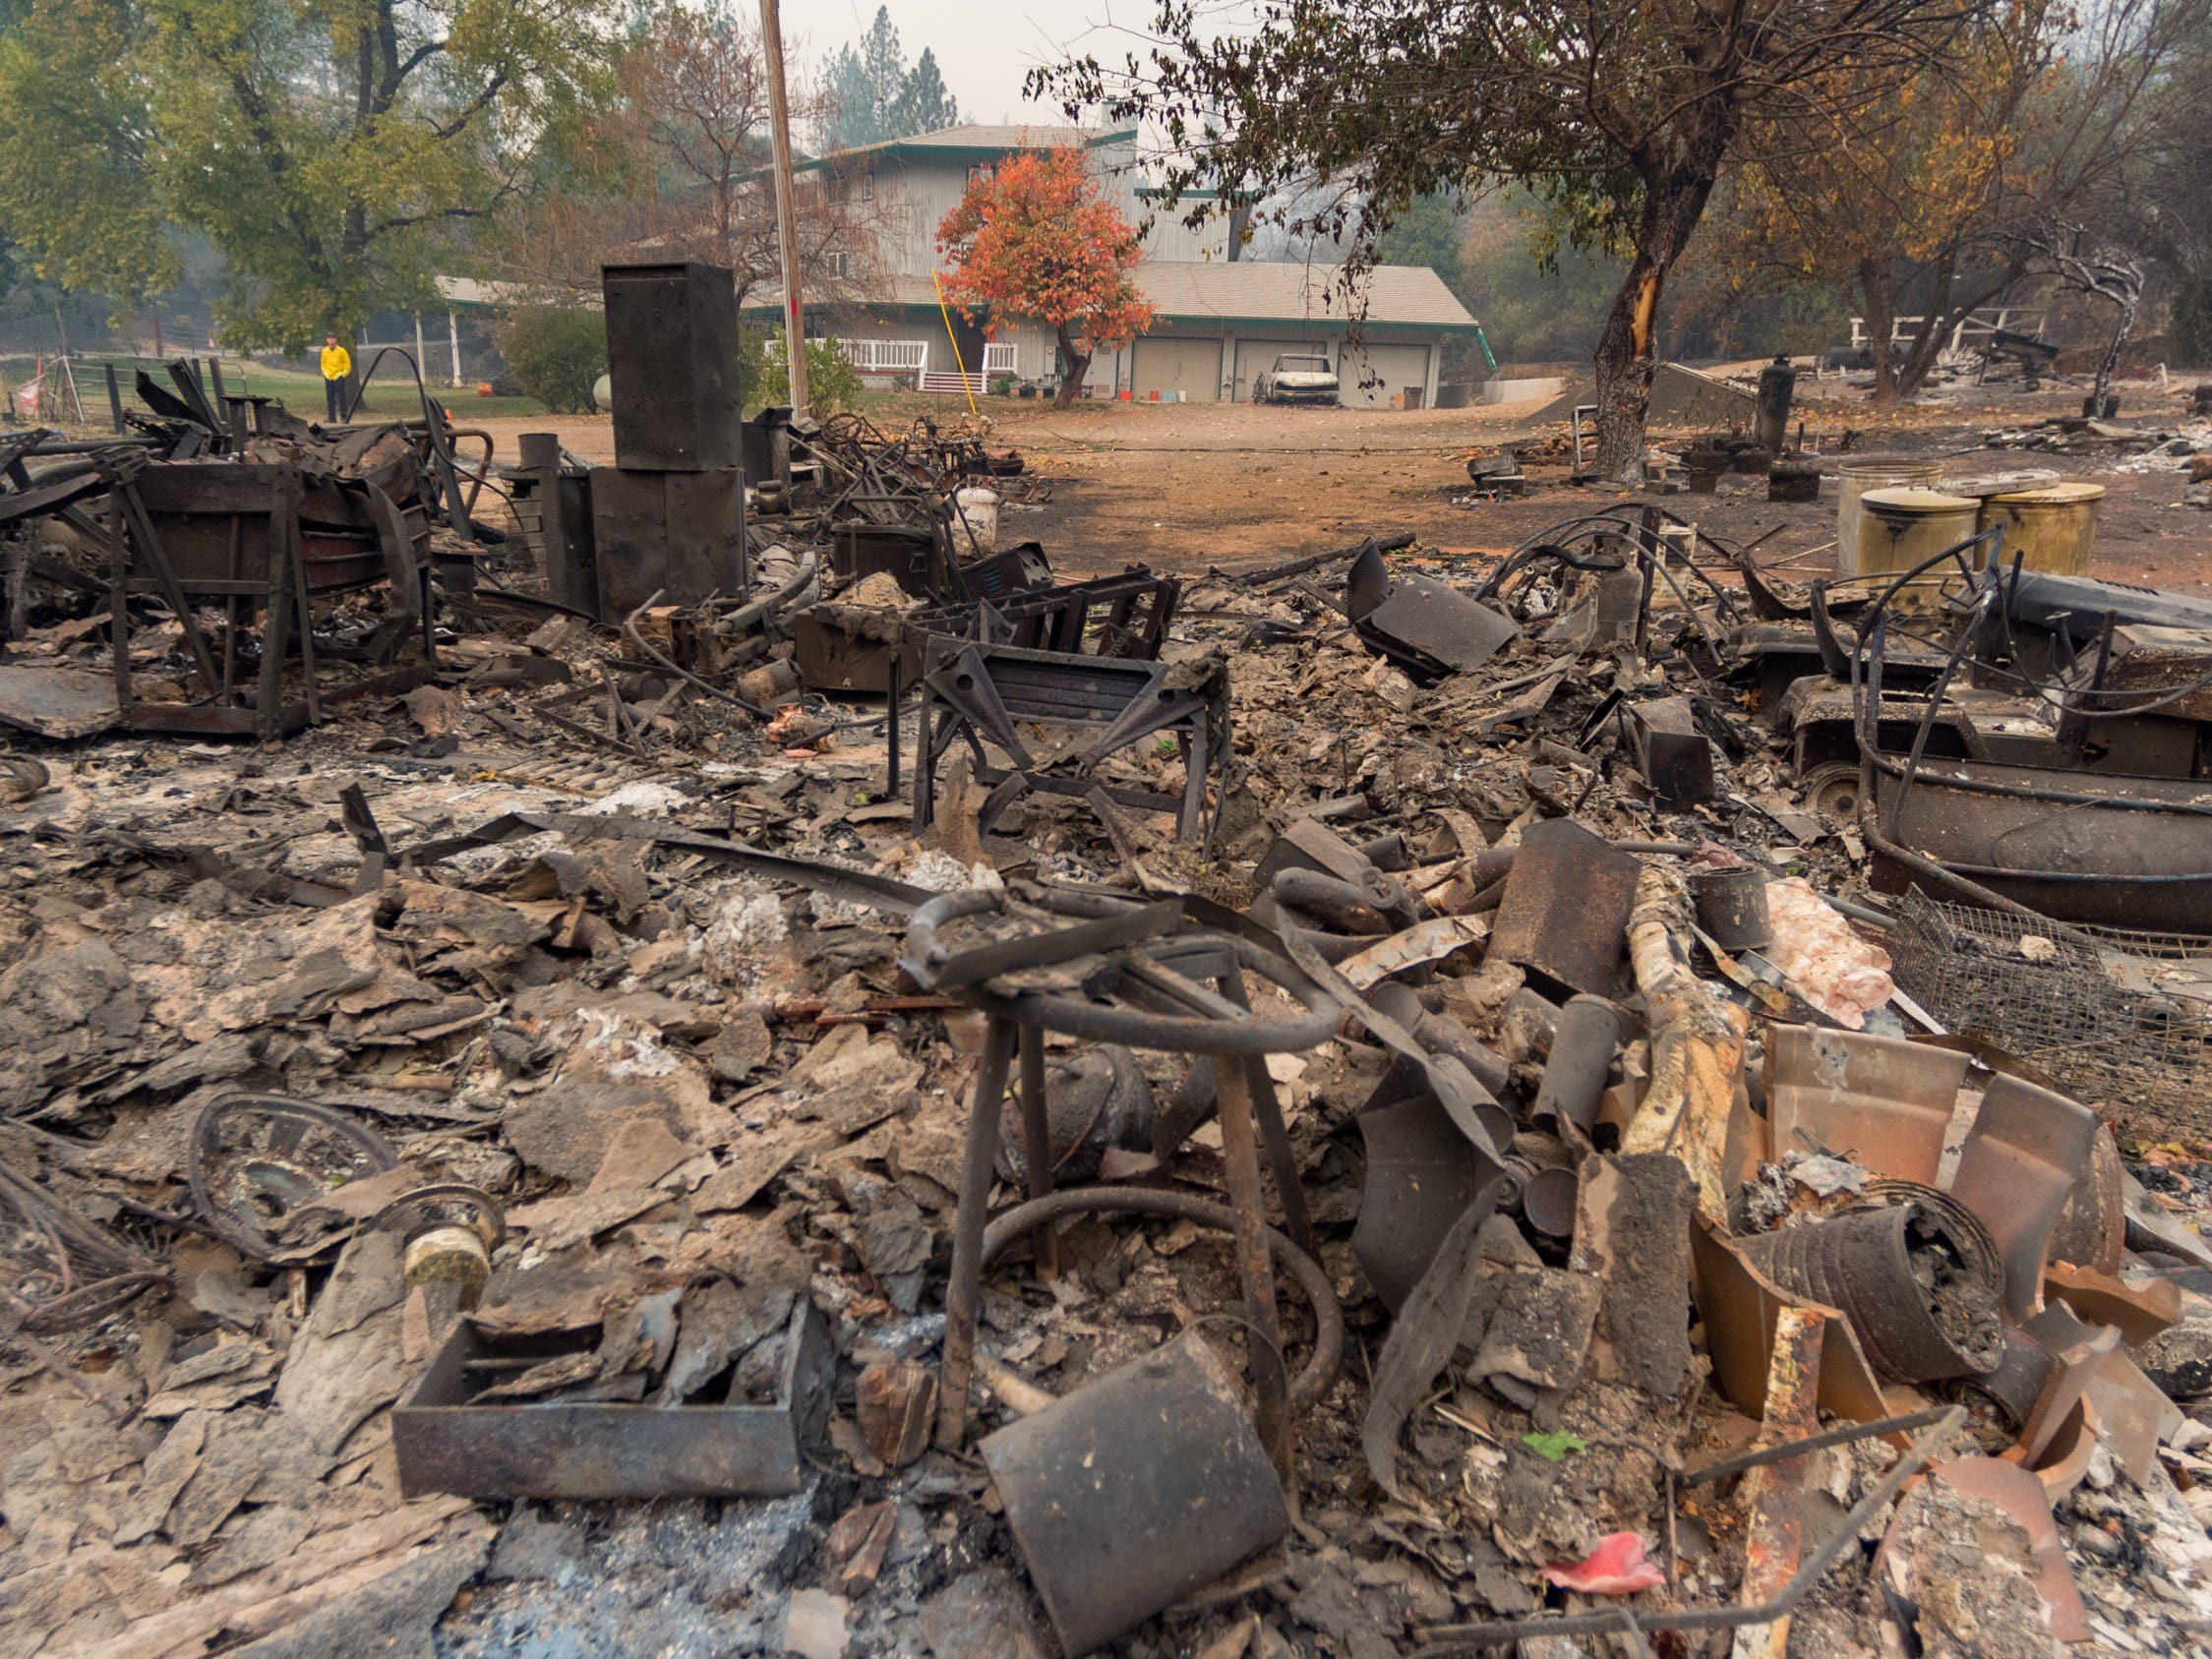 The Camp Fire causes extensive destruction near Butte Valley, Calf., Monday, Nov. 12, 2018.